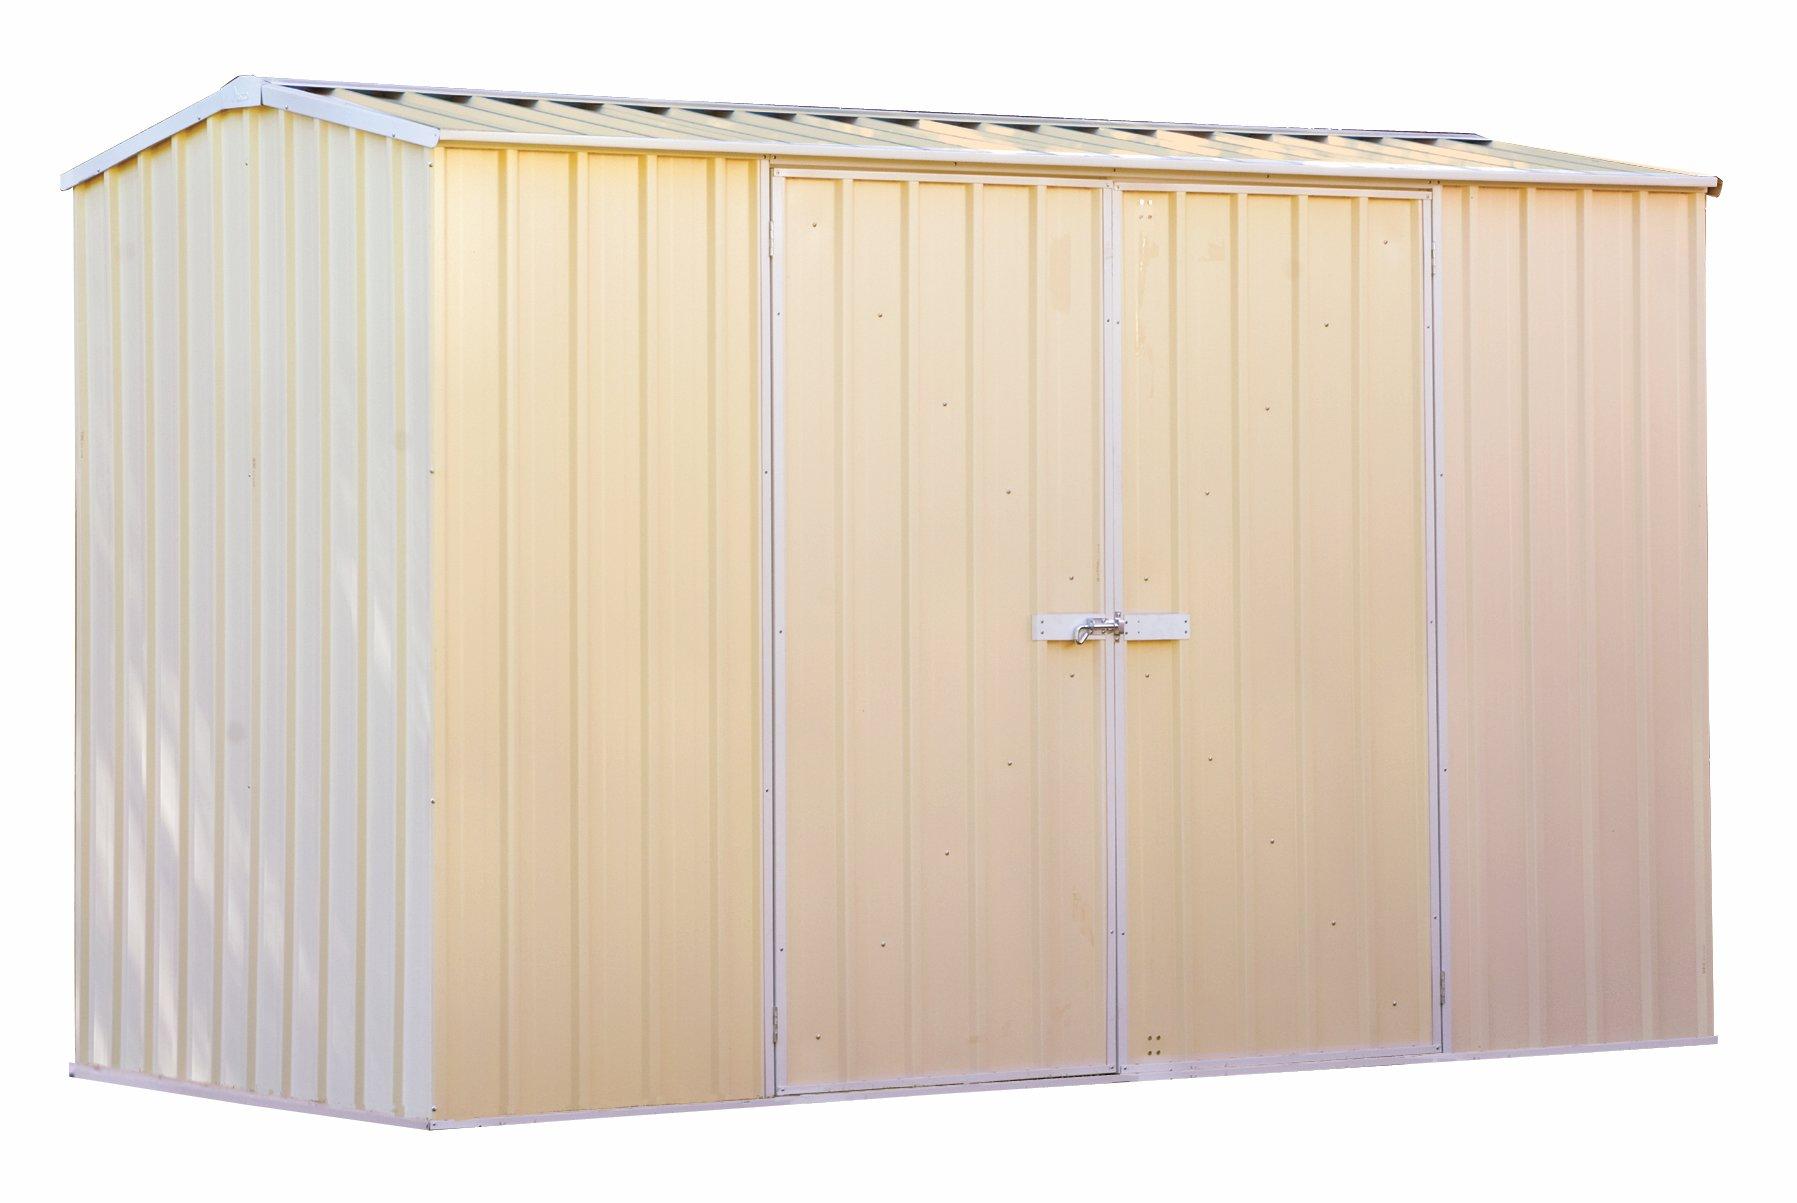 Garden Sheds 5m X 3m premier garden shed - 3m wide x 1.52m deep - colorbond - shedspot